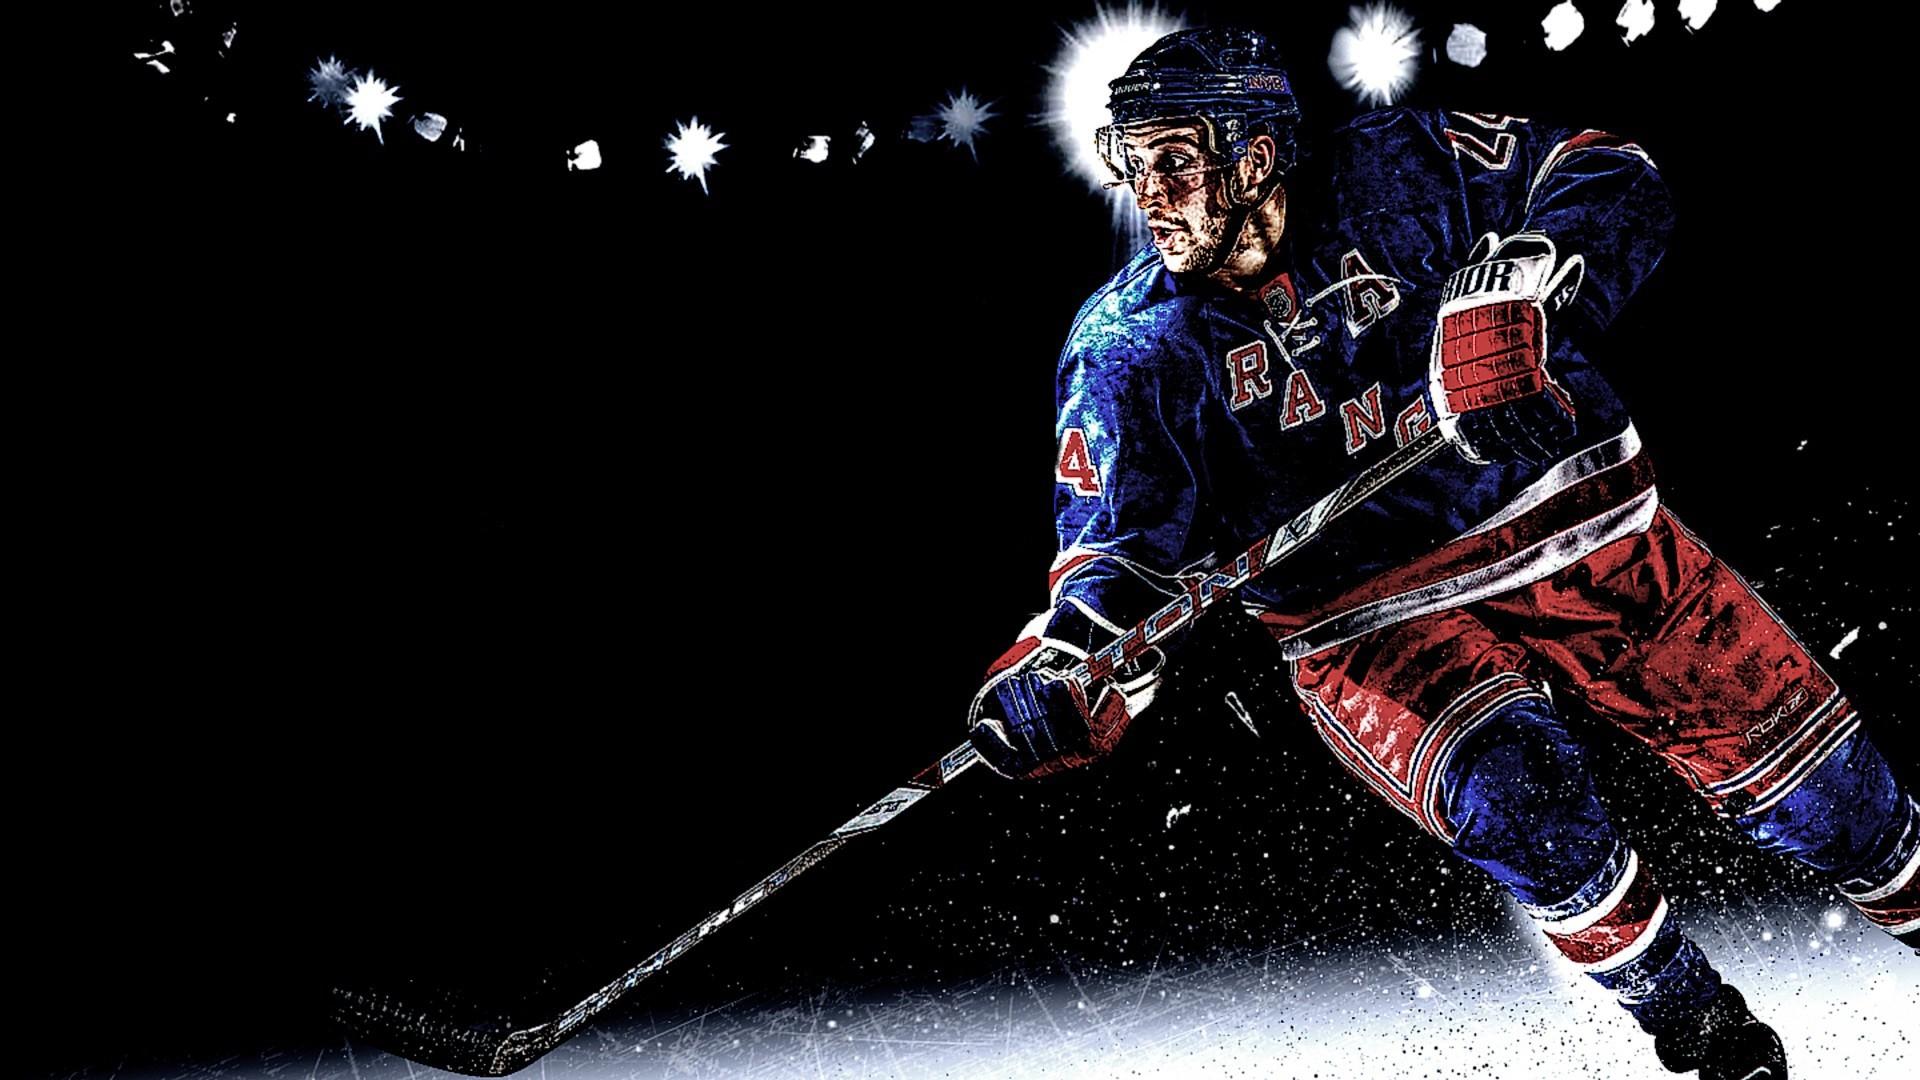 Preview Hockey Wallpaper | feelgrafix.com | Pinterest | Hockey sport,  Sports images and Hockey